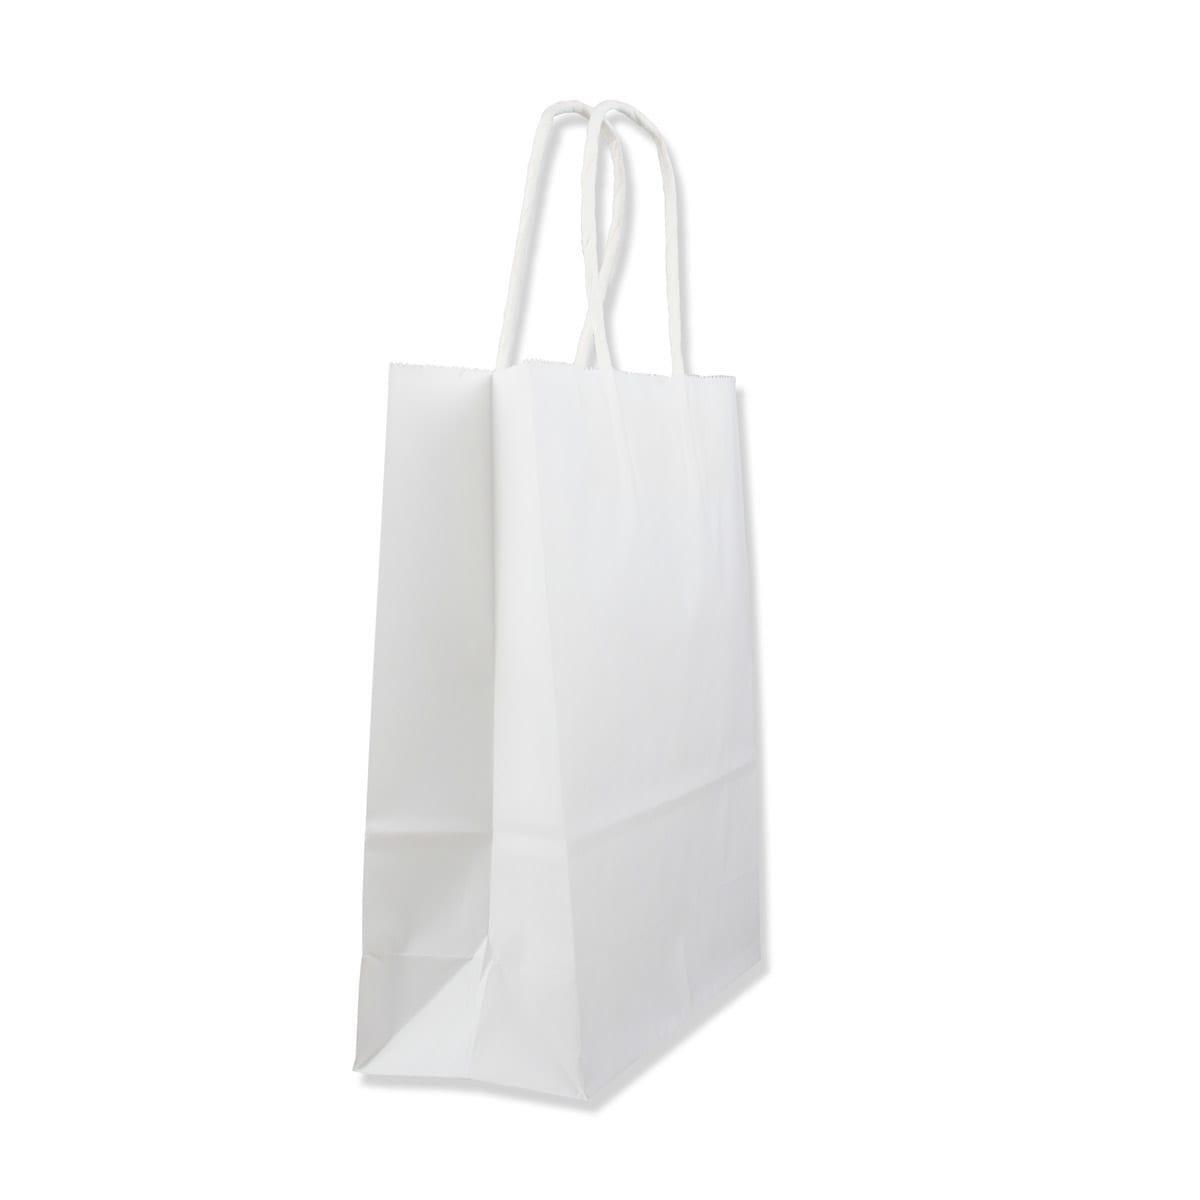 240x110x310mm WHITE TWIST HANDLED PAPER BAG